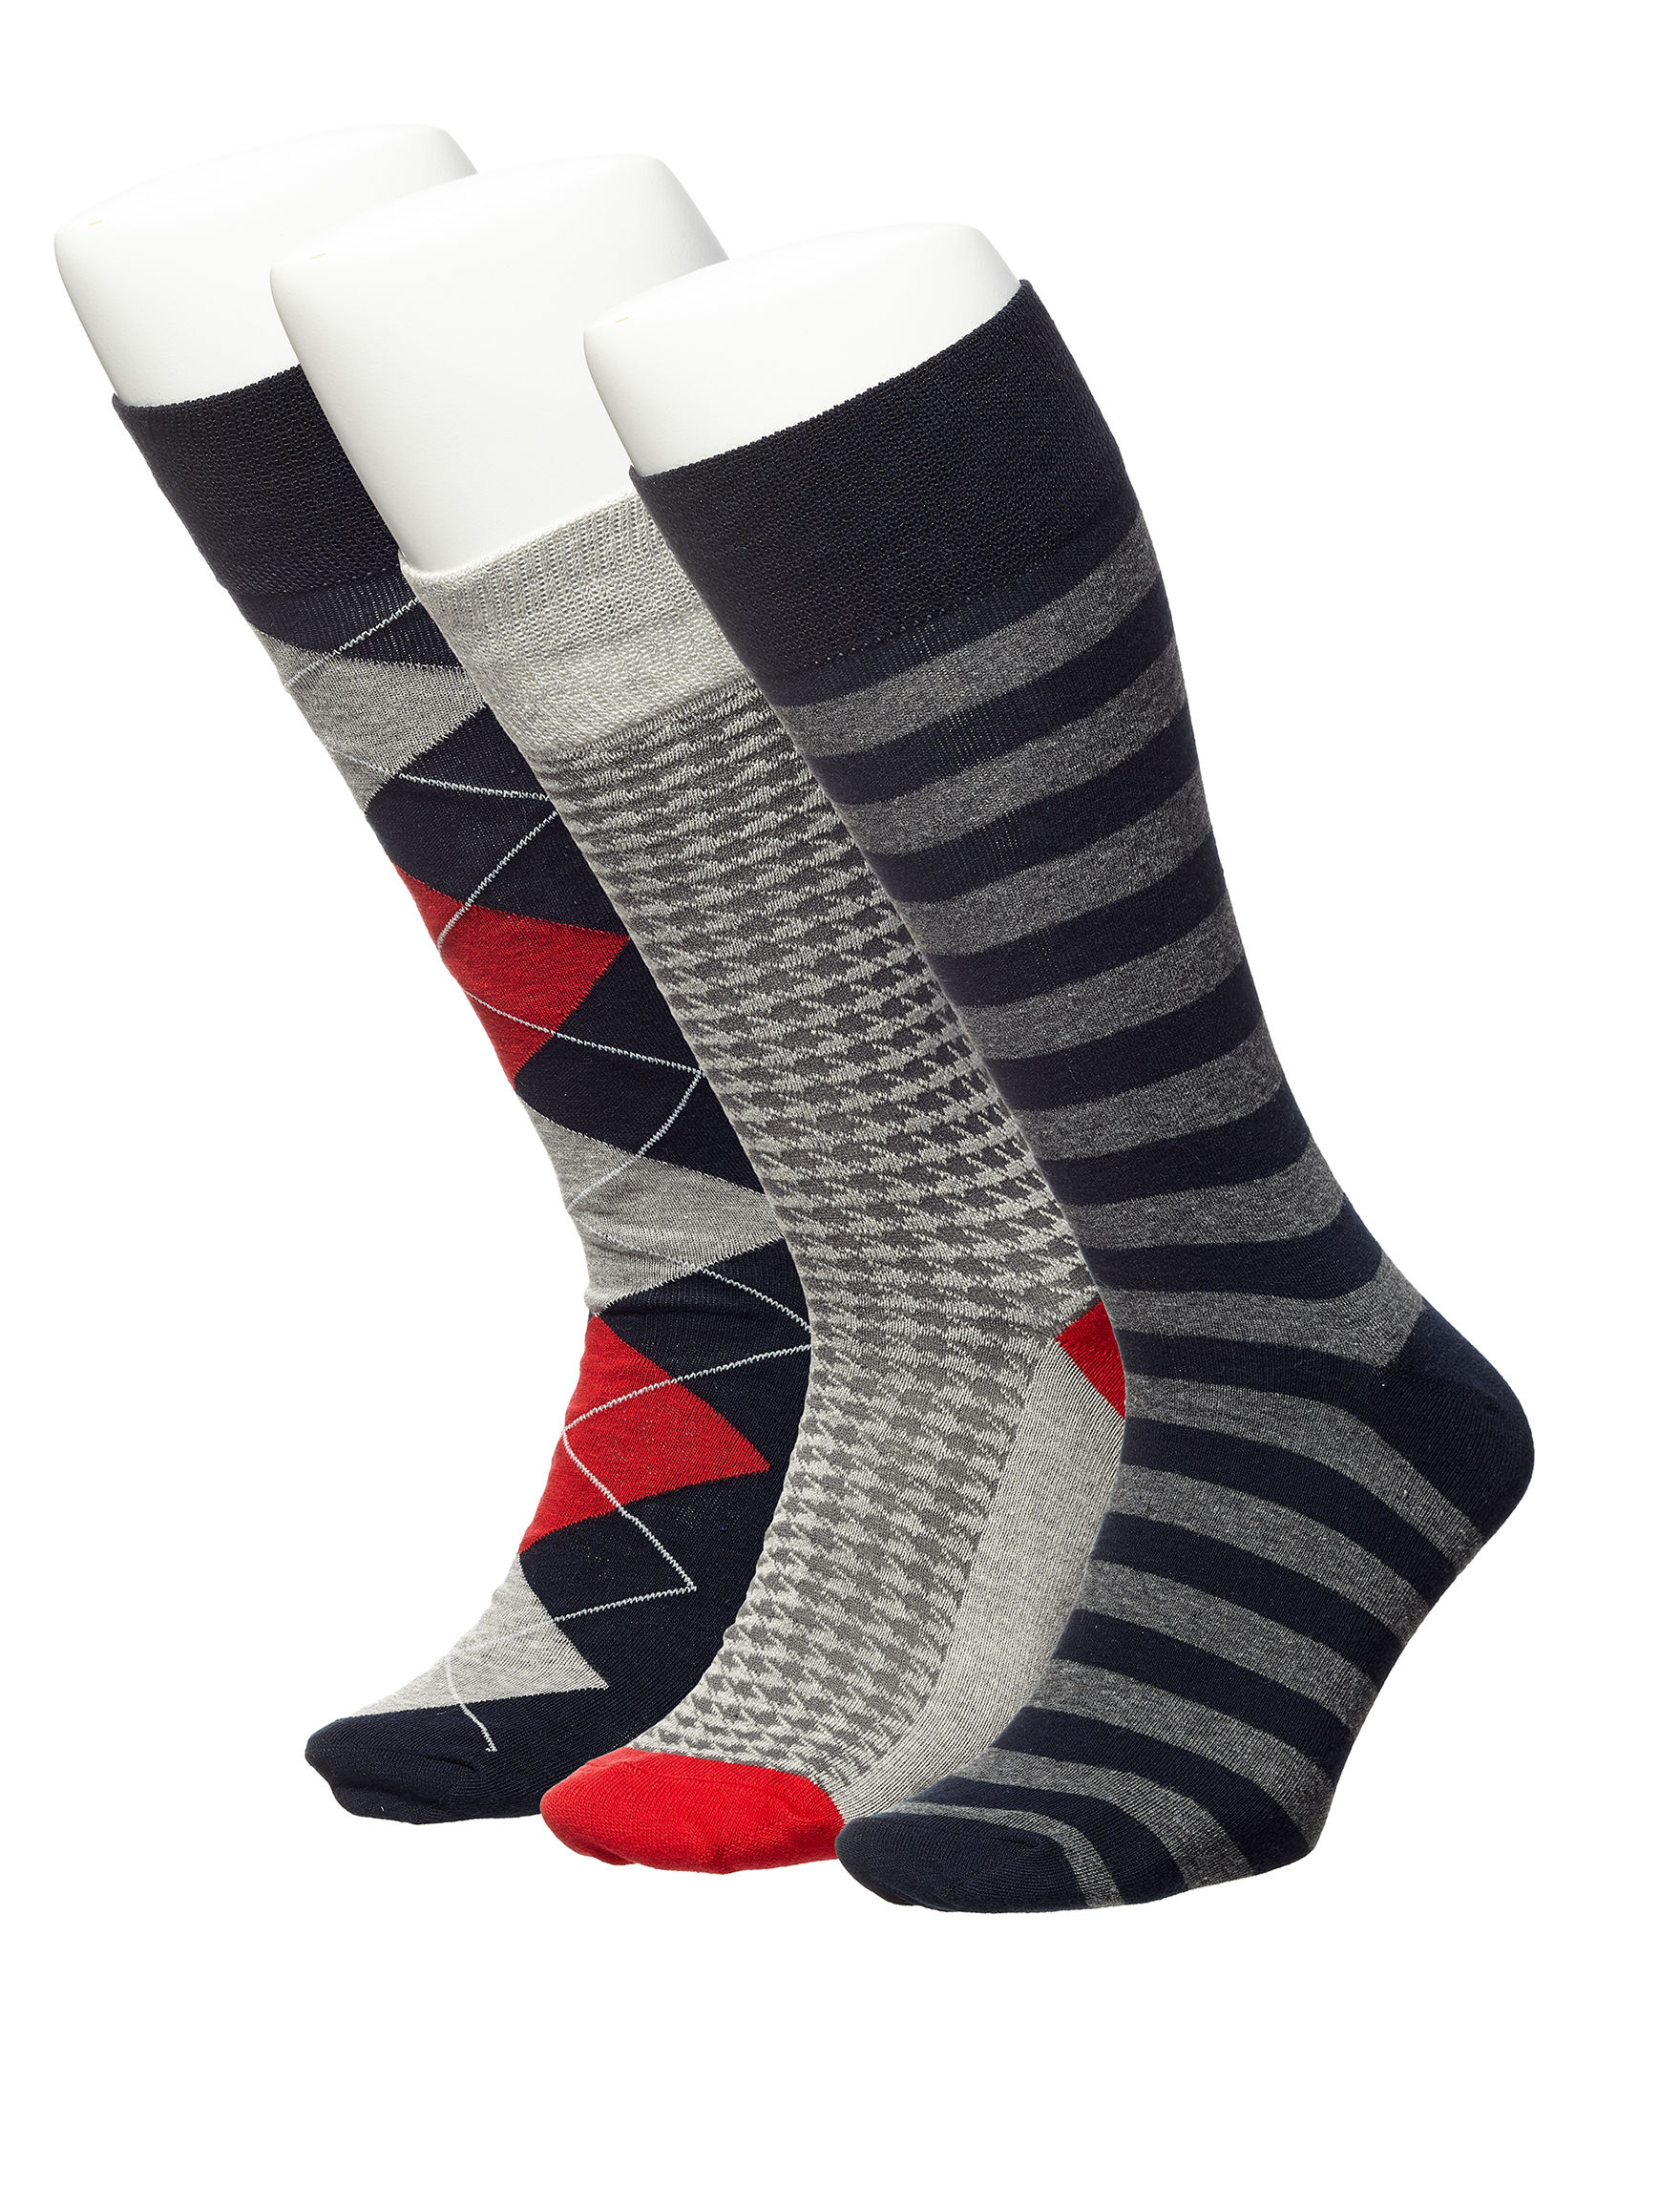 Ivy Crew Black Stripe Socks